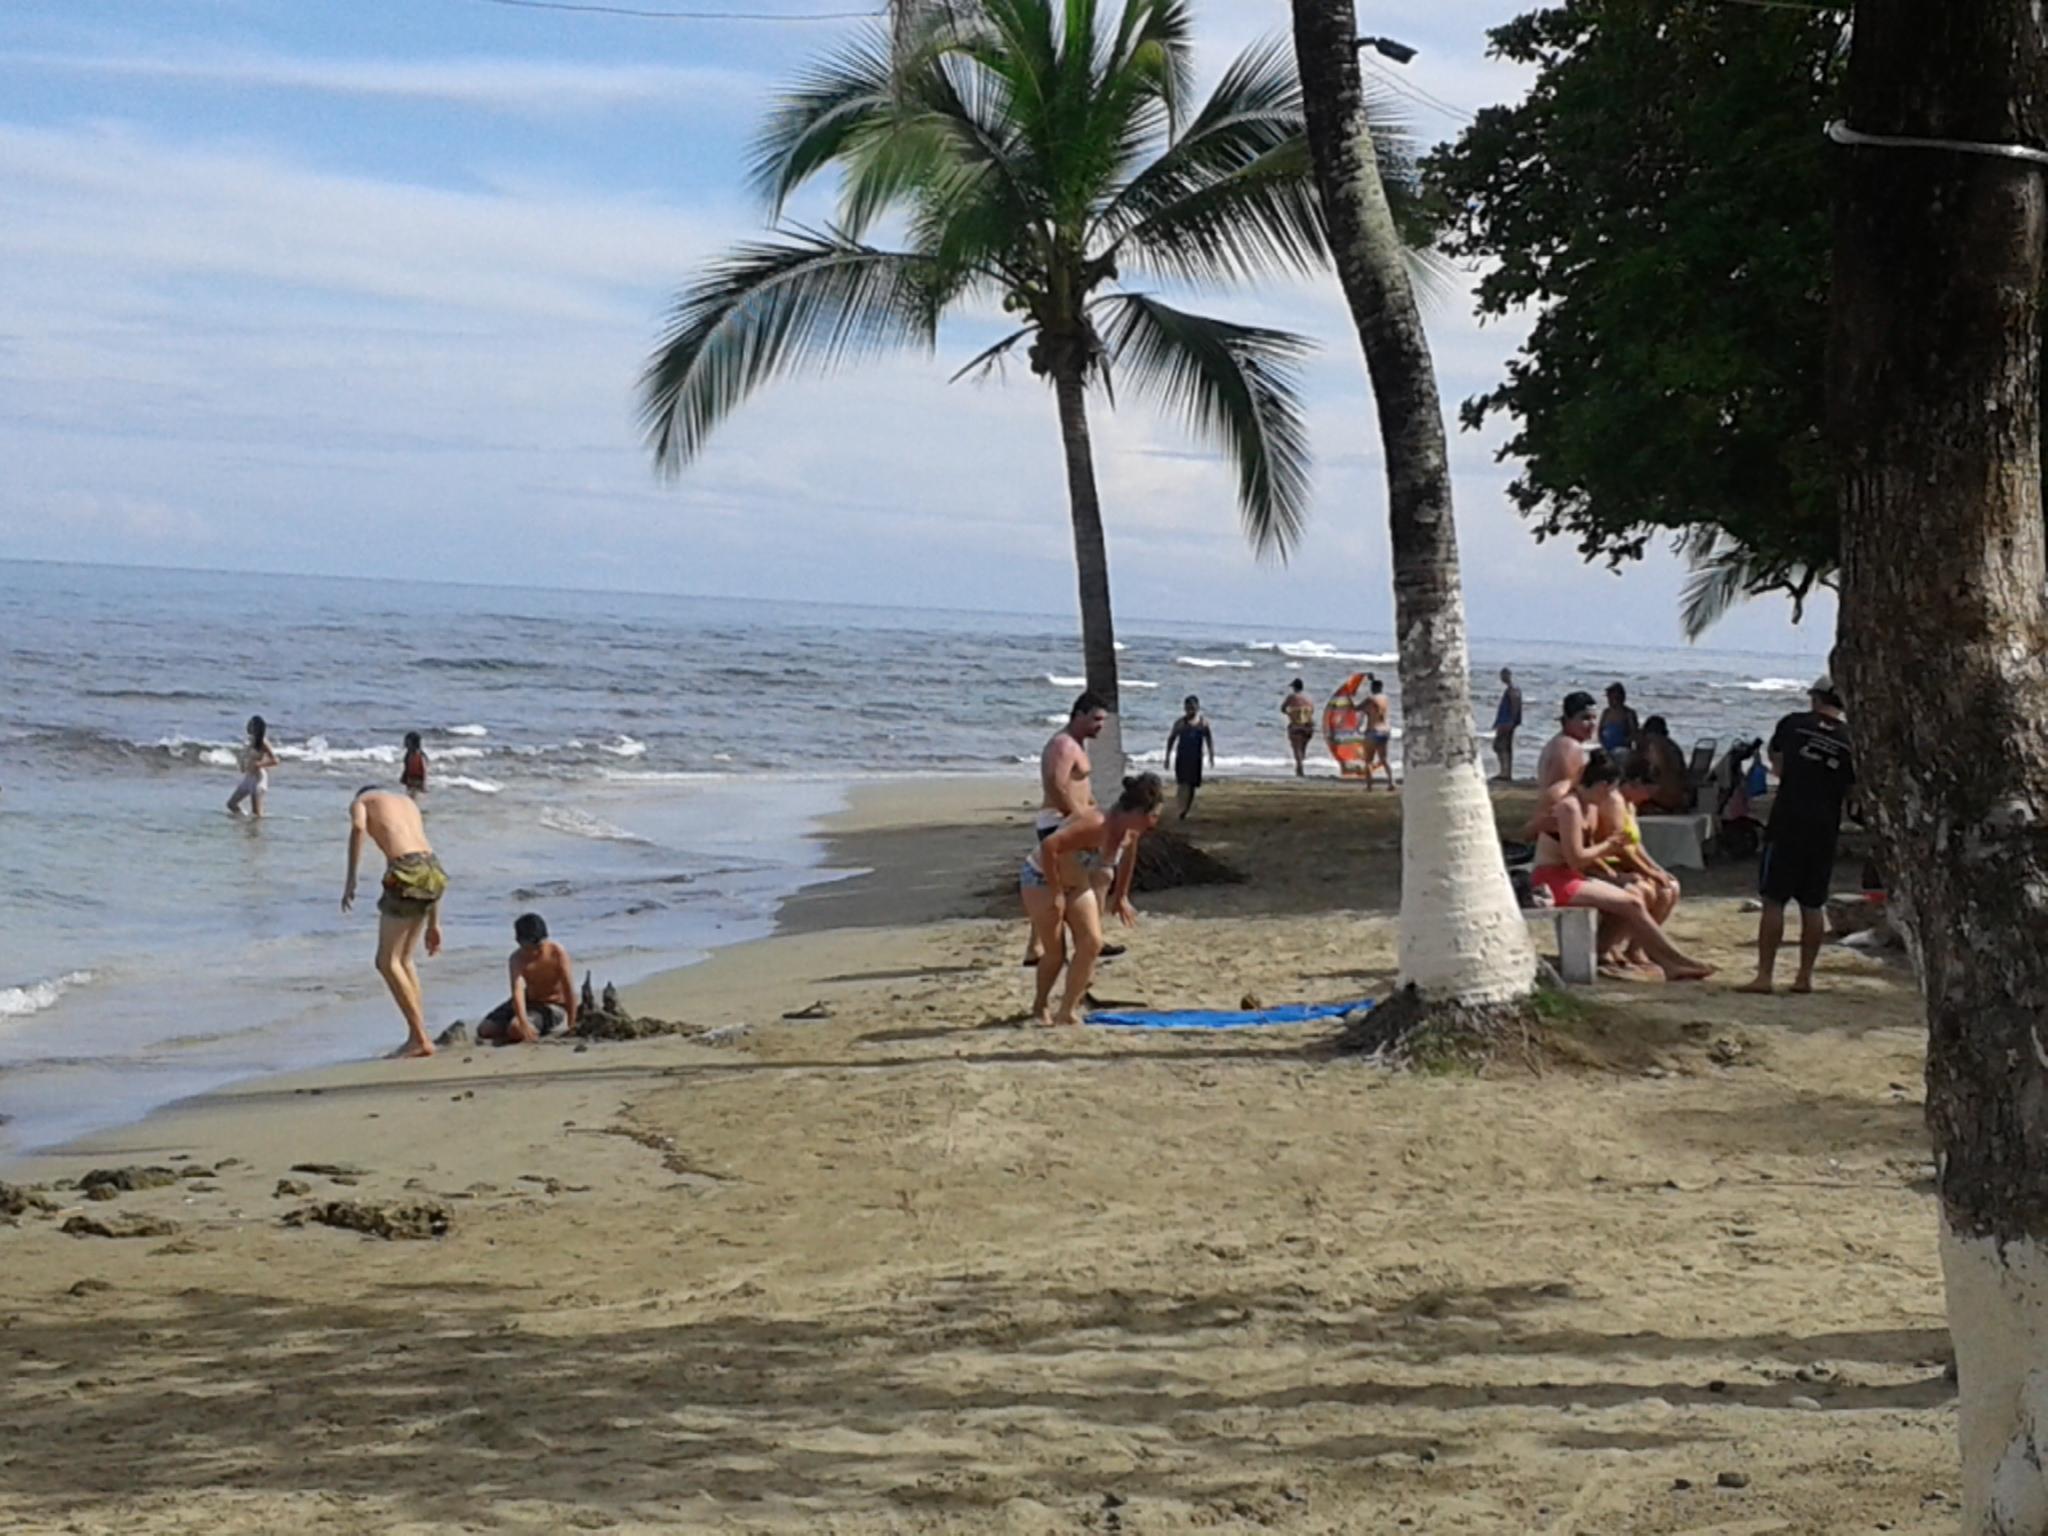 Badestrand Puerto Viejo – Karibik (Costa Rica)